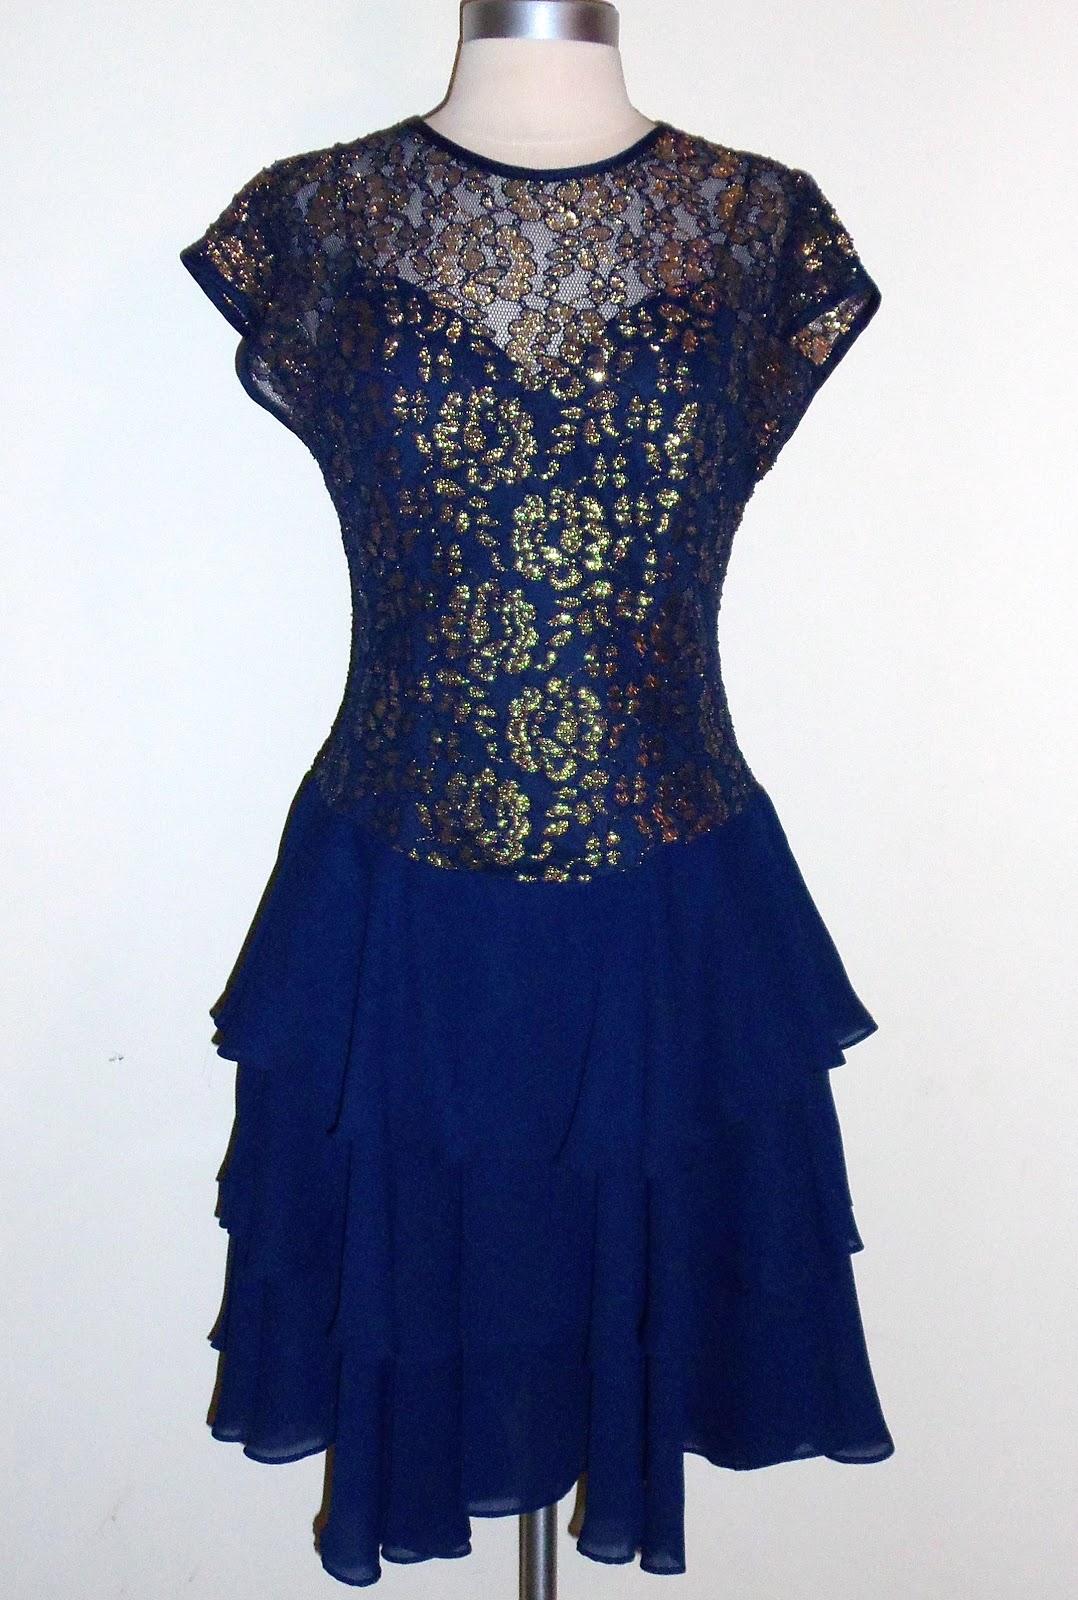 Thrifty Prom Dresses 31